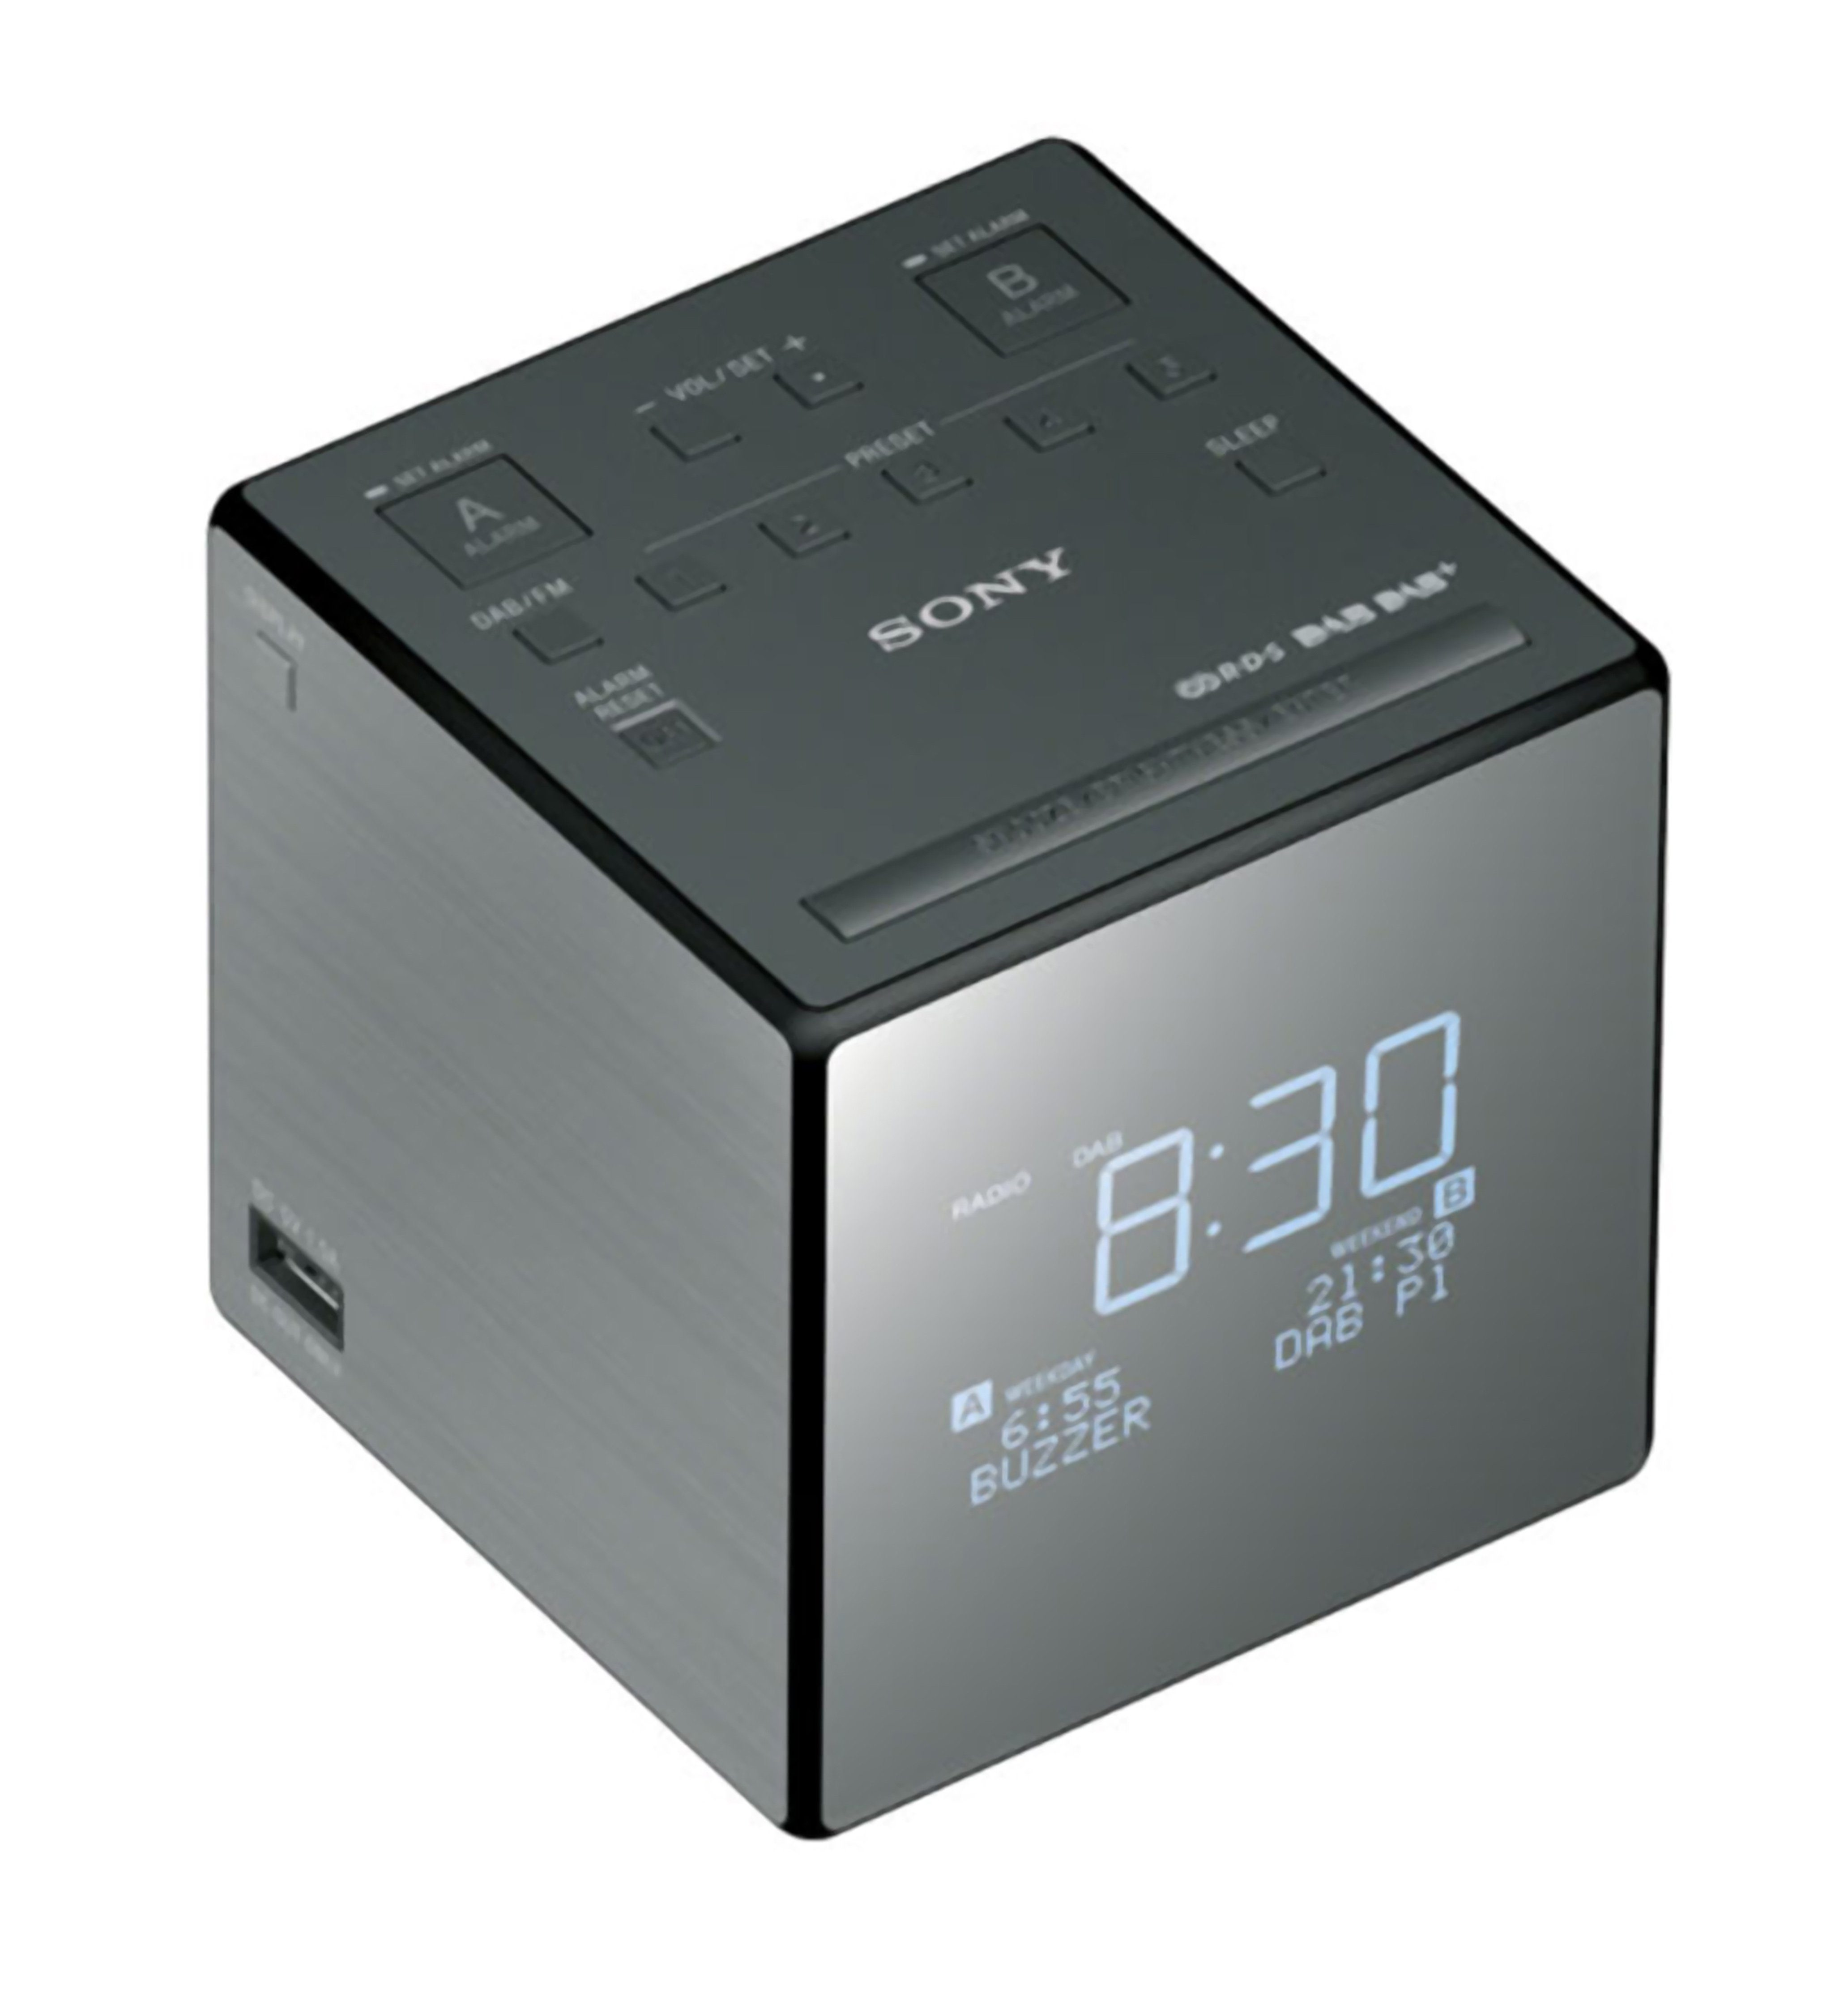 Sony Tragbares DAB / DAB+ / UKW Uhrenradio mit USB-Anschluss »XDR-C1DBP«